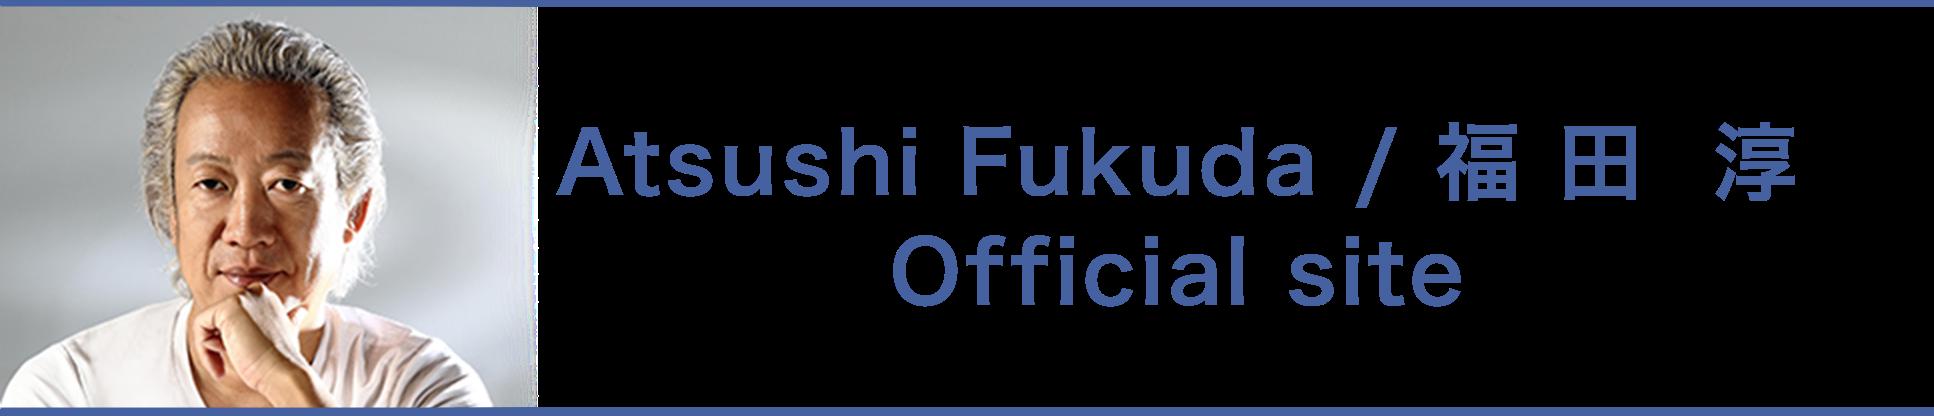 Atsushi Fukuda / 福田 淳 Official site